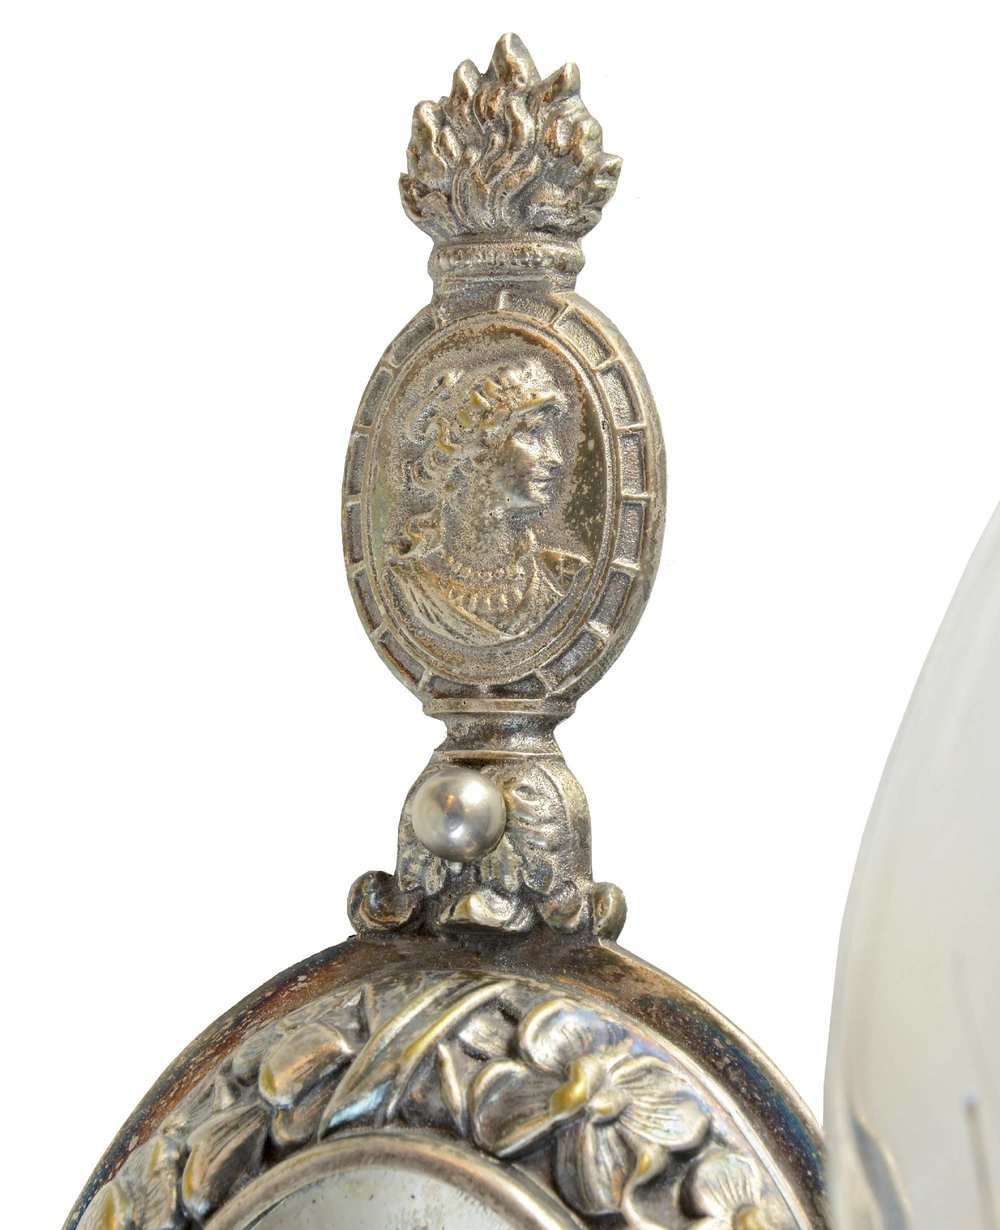 46800-moran-hastings-silver-mirror-sconce-cameo-detail.jpg